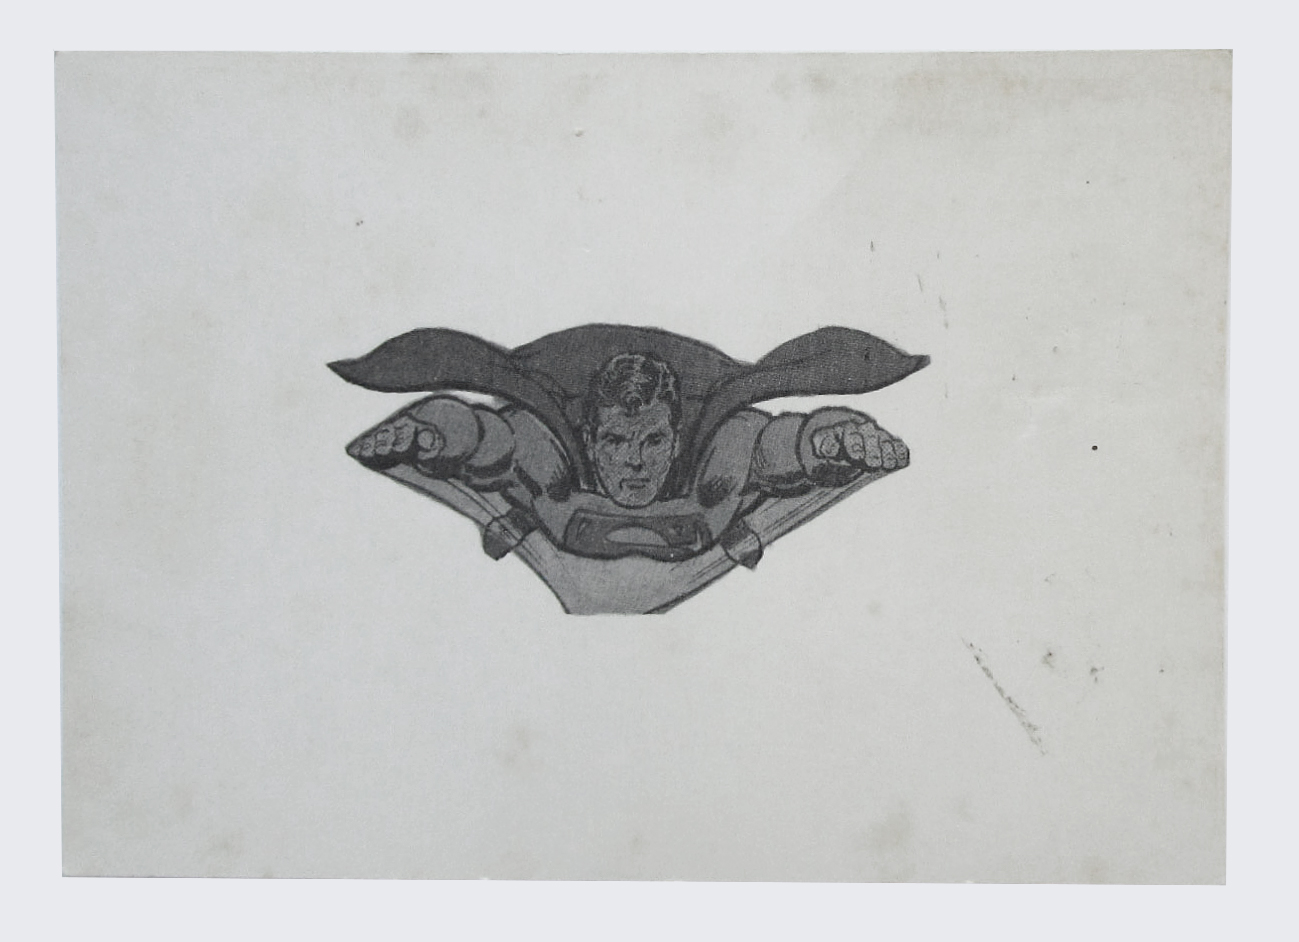 Marroquin_superbman_postcard_recto-web.jpg